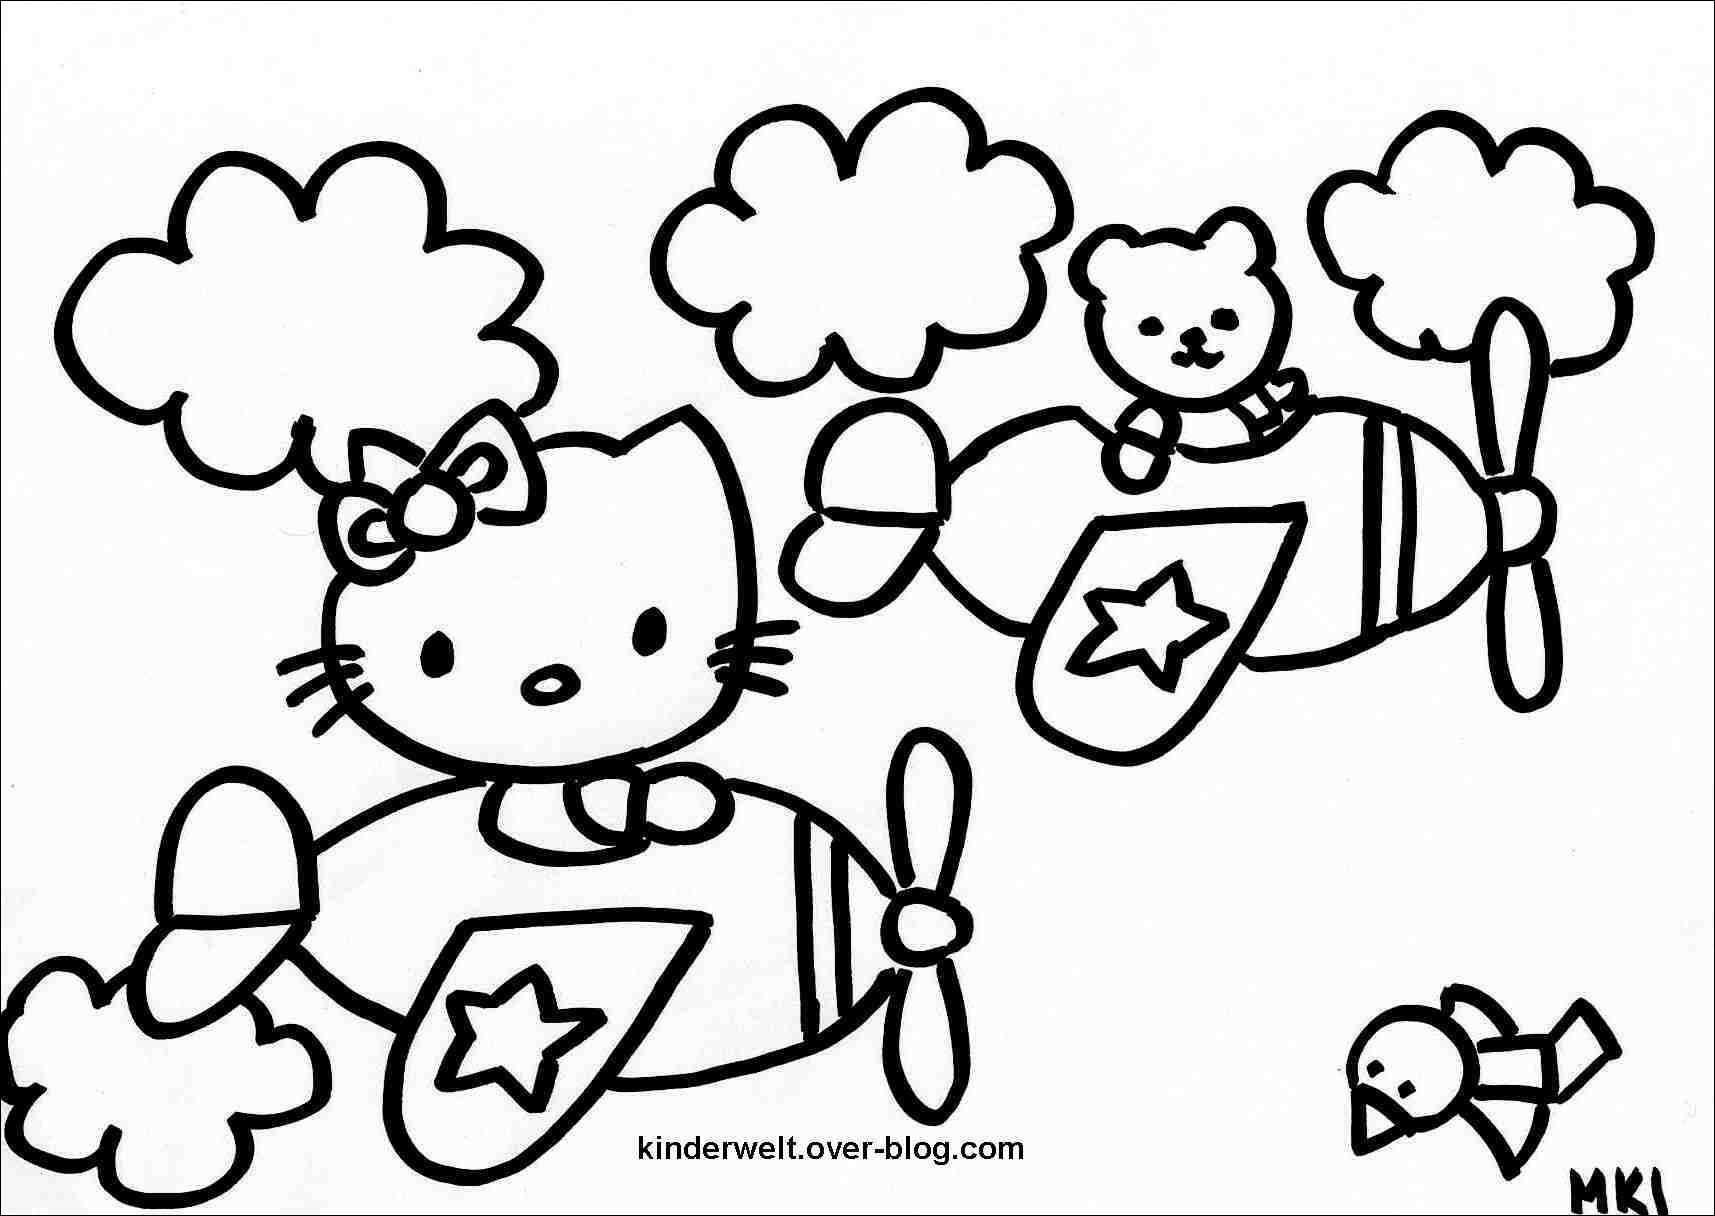 Ausmalbild Hello Kitty Neu Kostenlose Ausmalbilder Hello Kitty Image Malvorlagen Igel Elegant Fotografieren